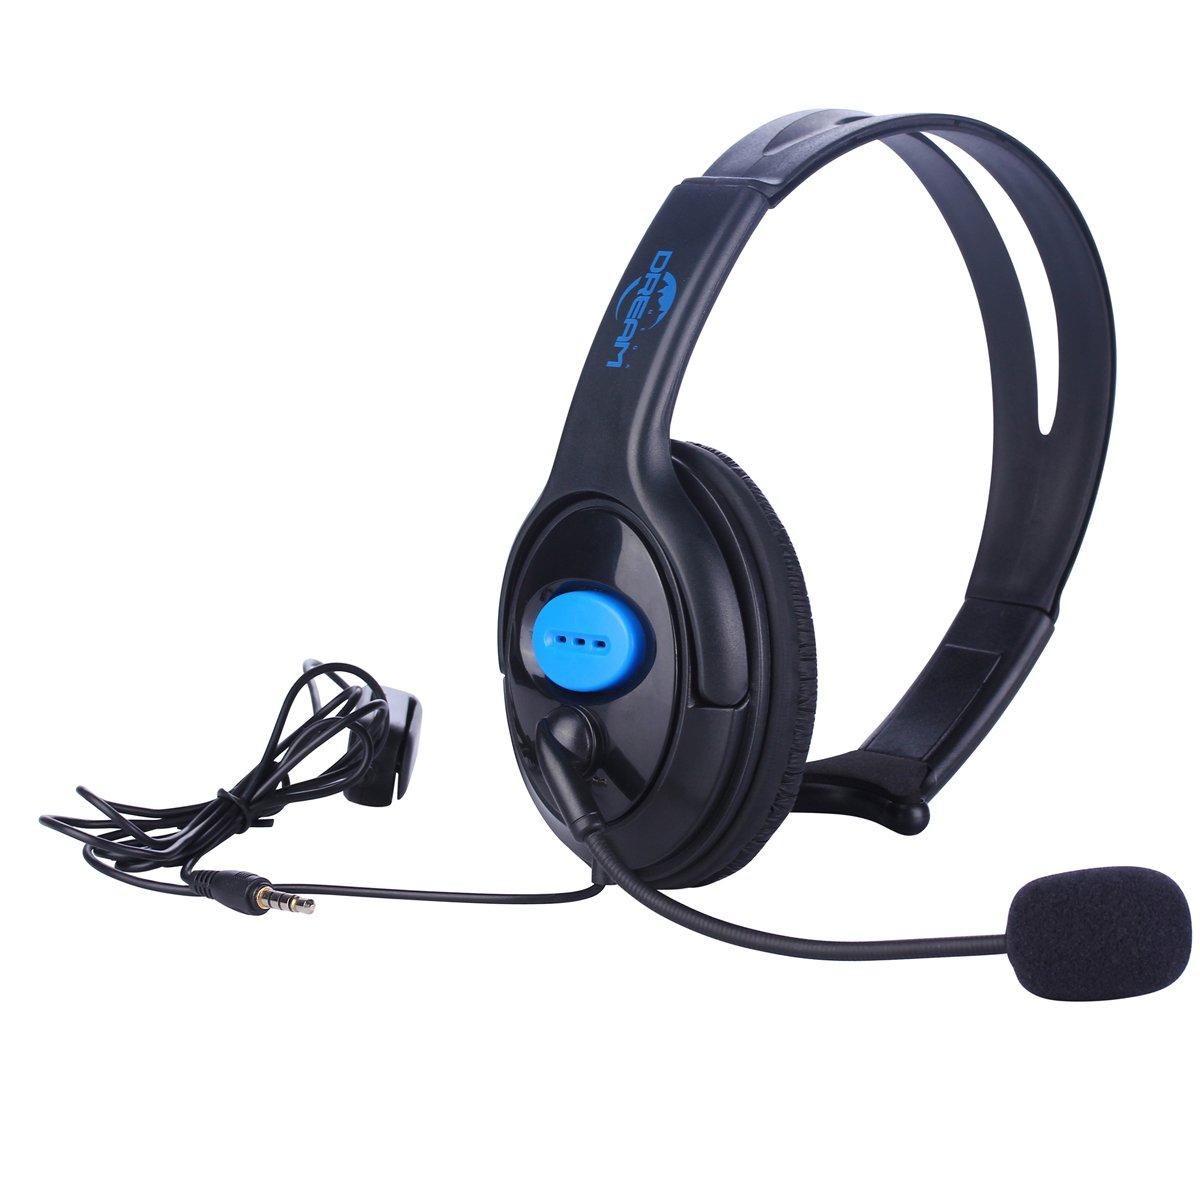 ps4 gaming headset cestore unilateral audio jack. Black Bedroom Furniture Sets. Home Design Ideas